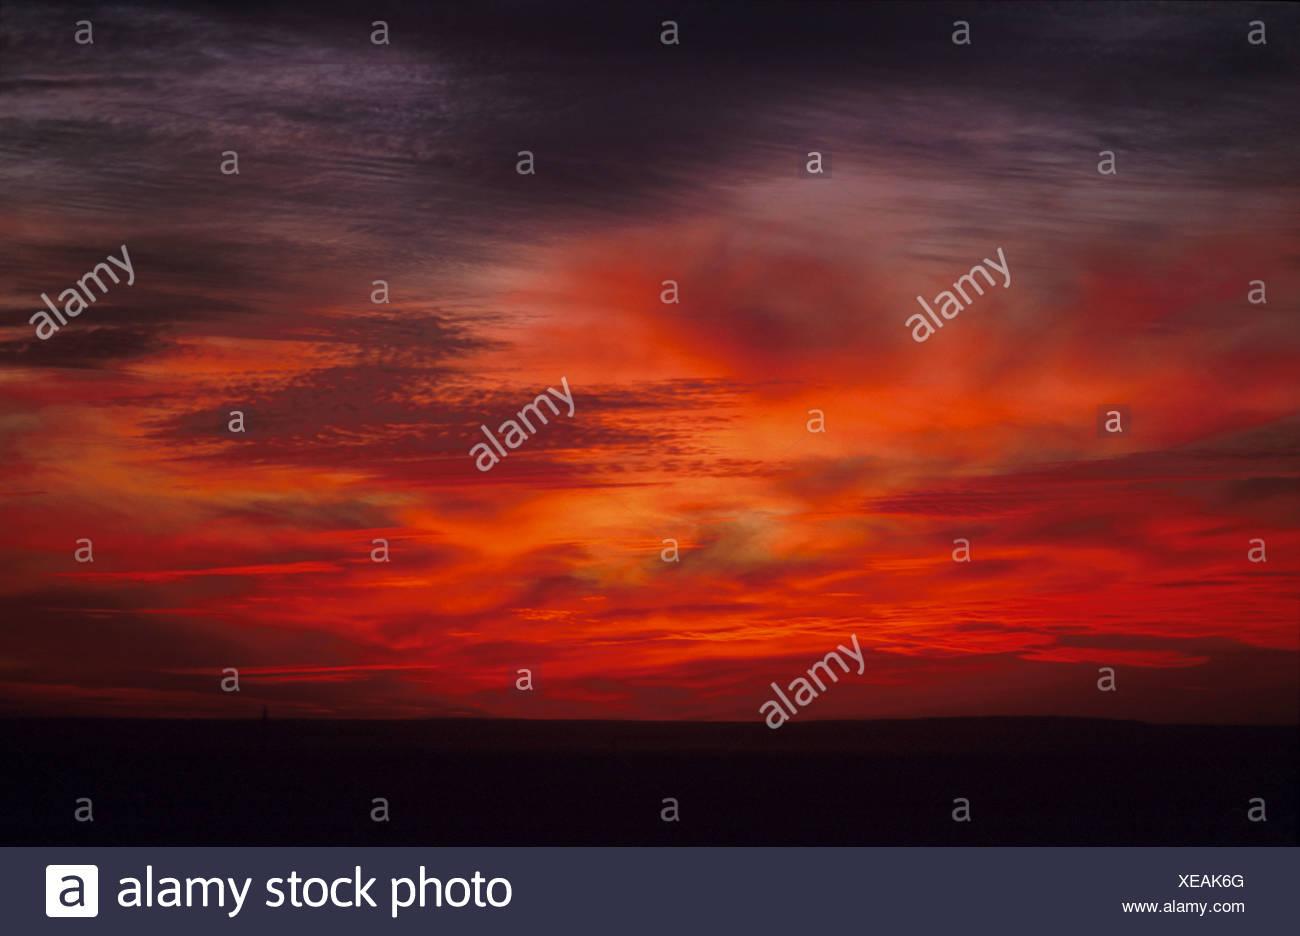 Sonnenuntergang Mari, Syrien - Stock Image